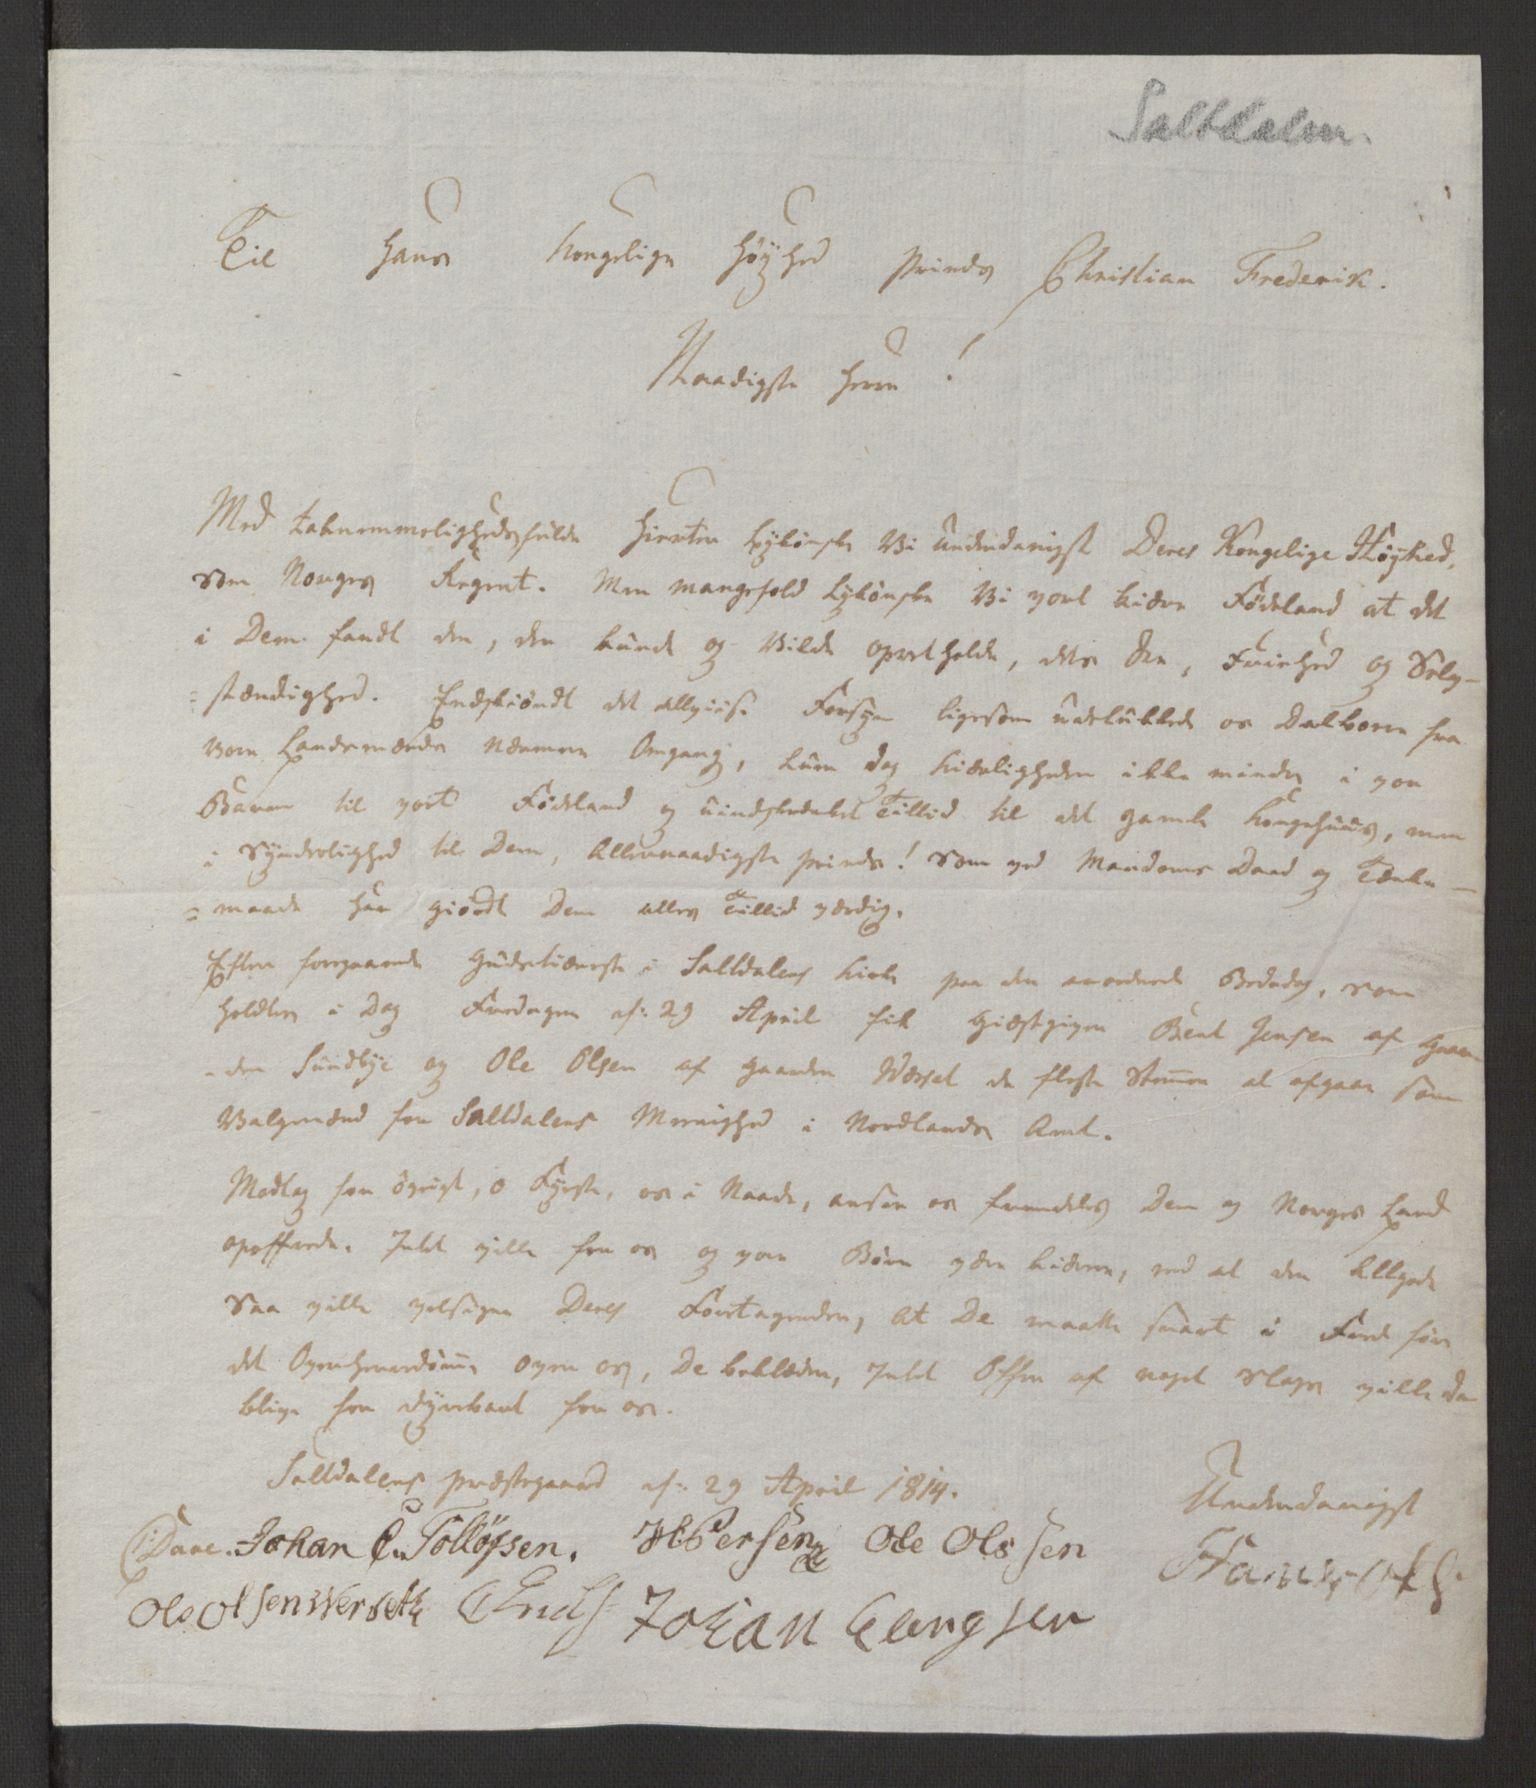 SAT, Nordland amt/fylke*, 1814, s. 41